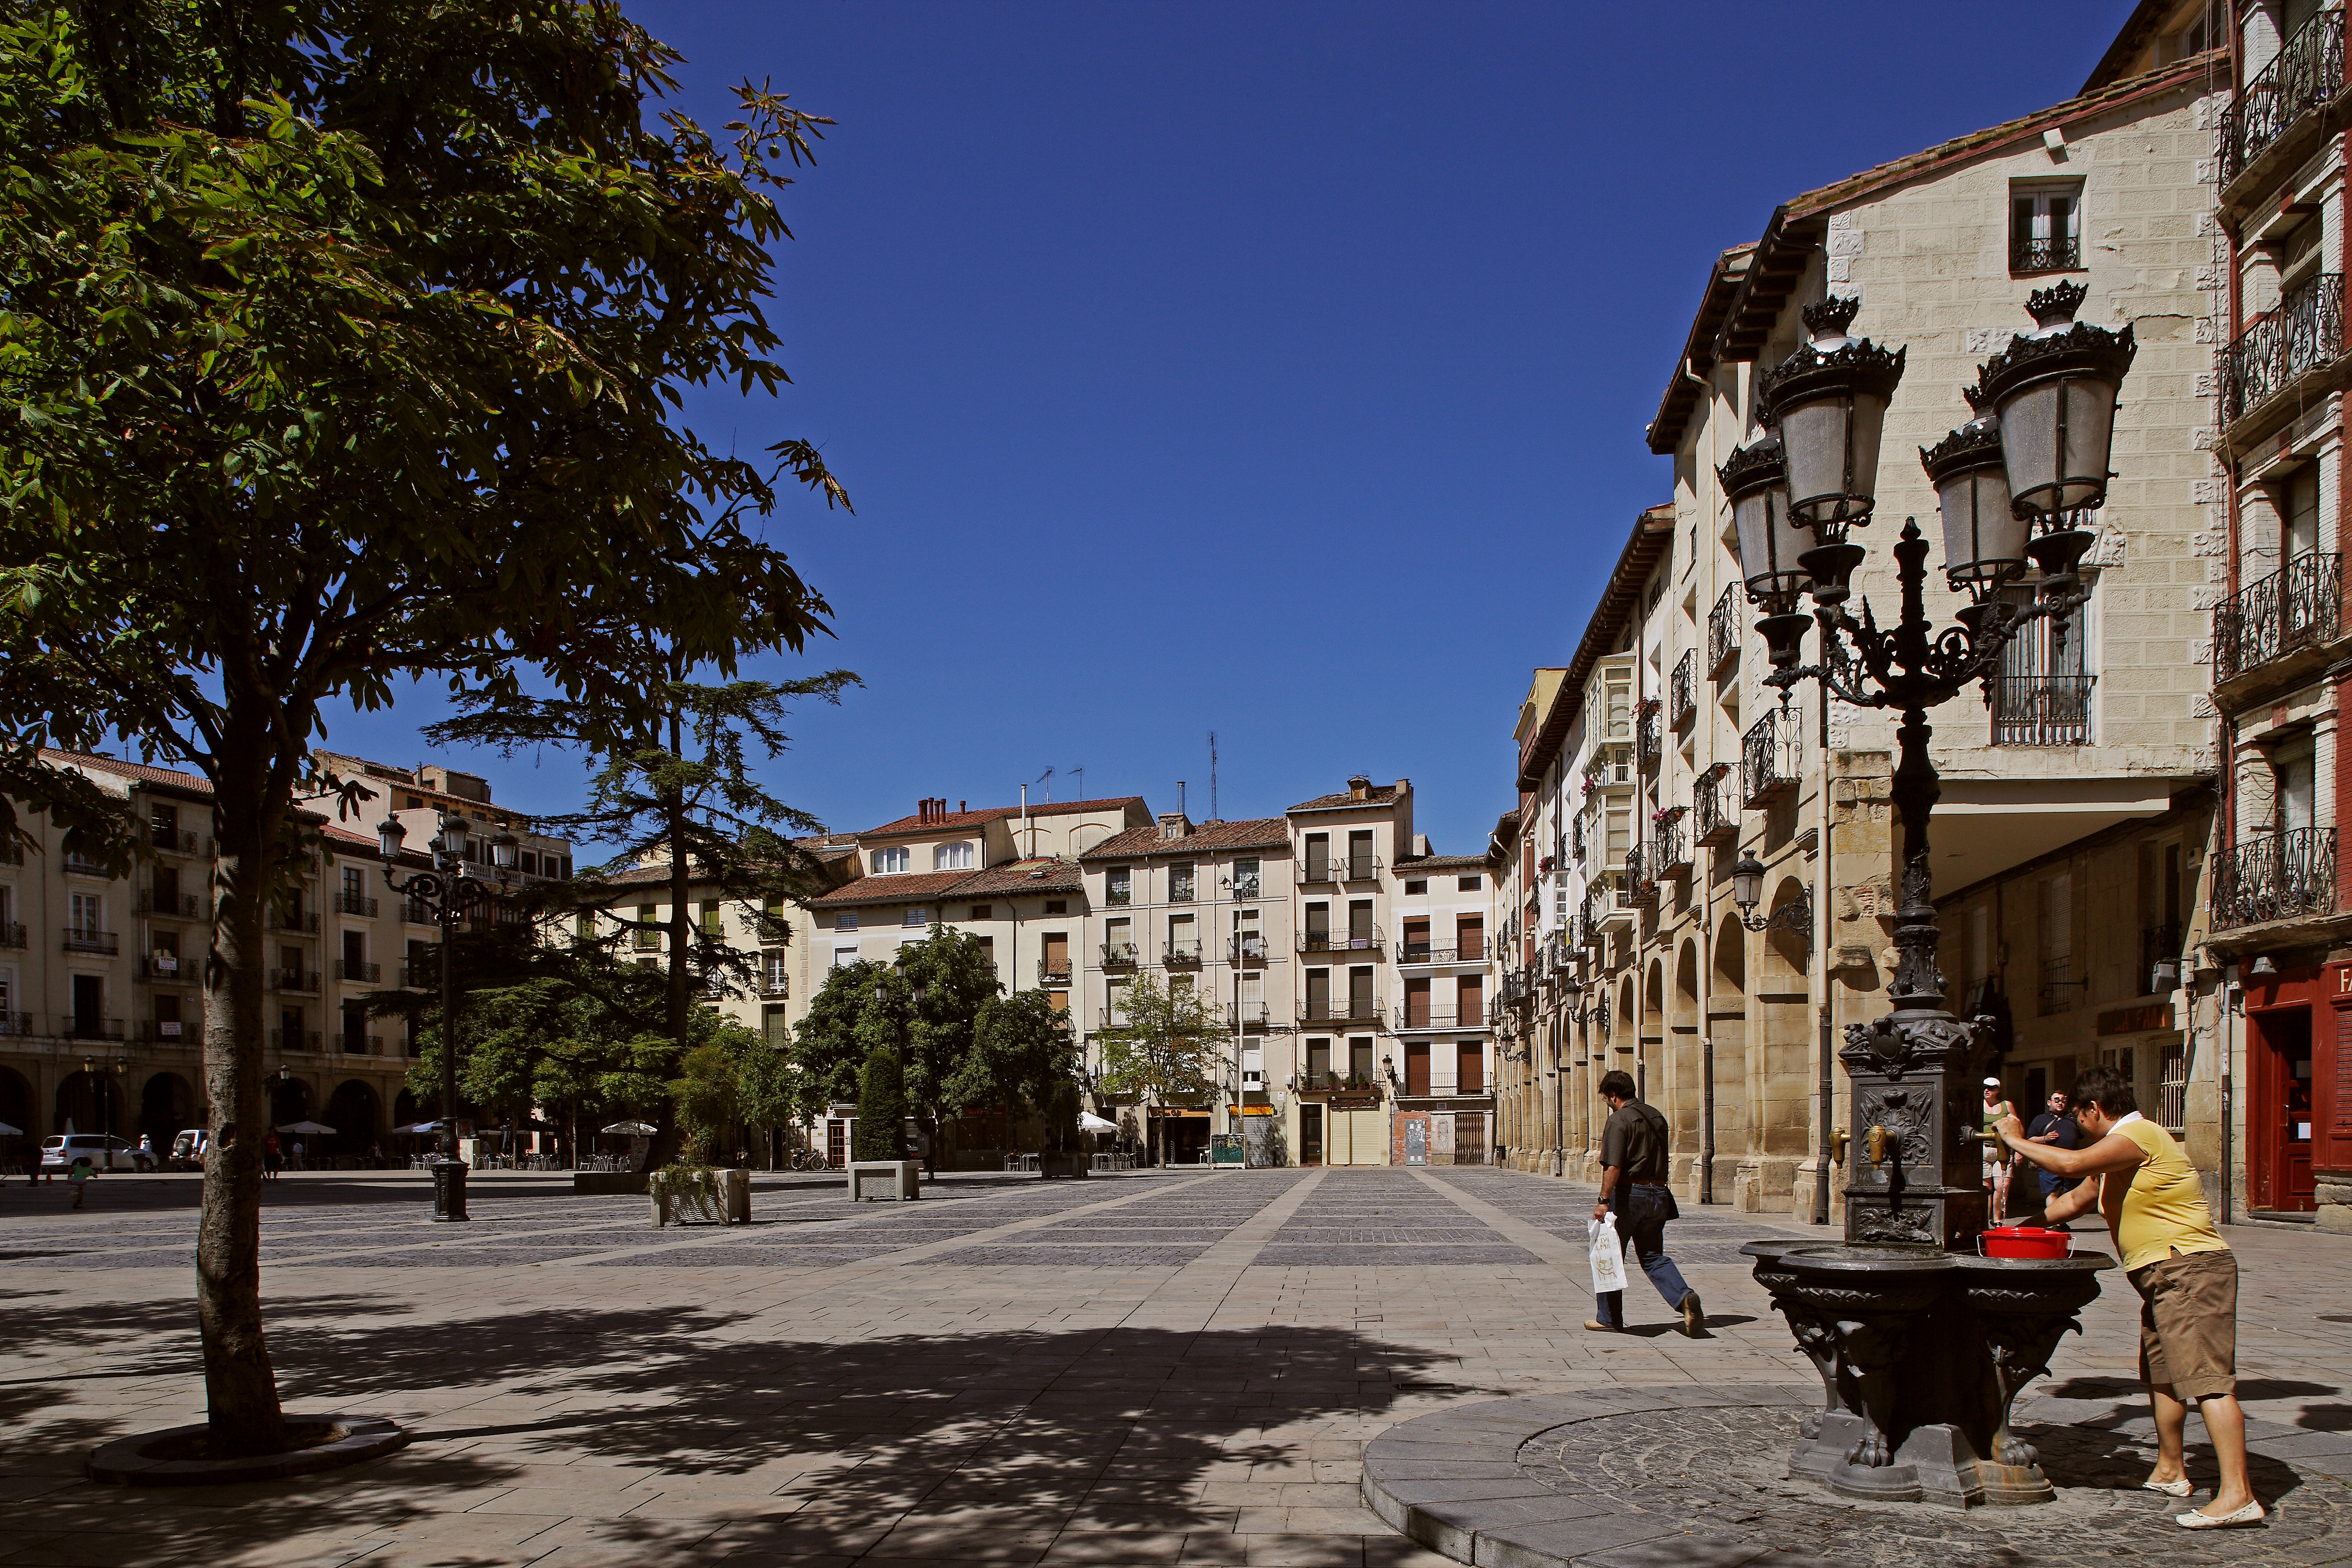 Plaza del Mercado - Logroño